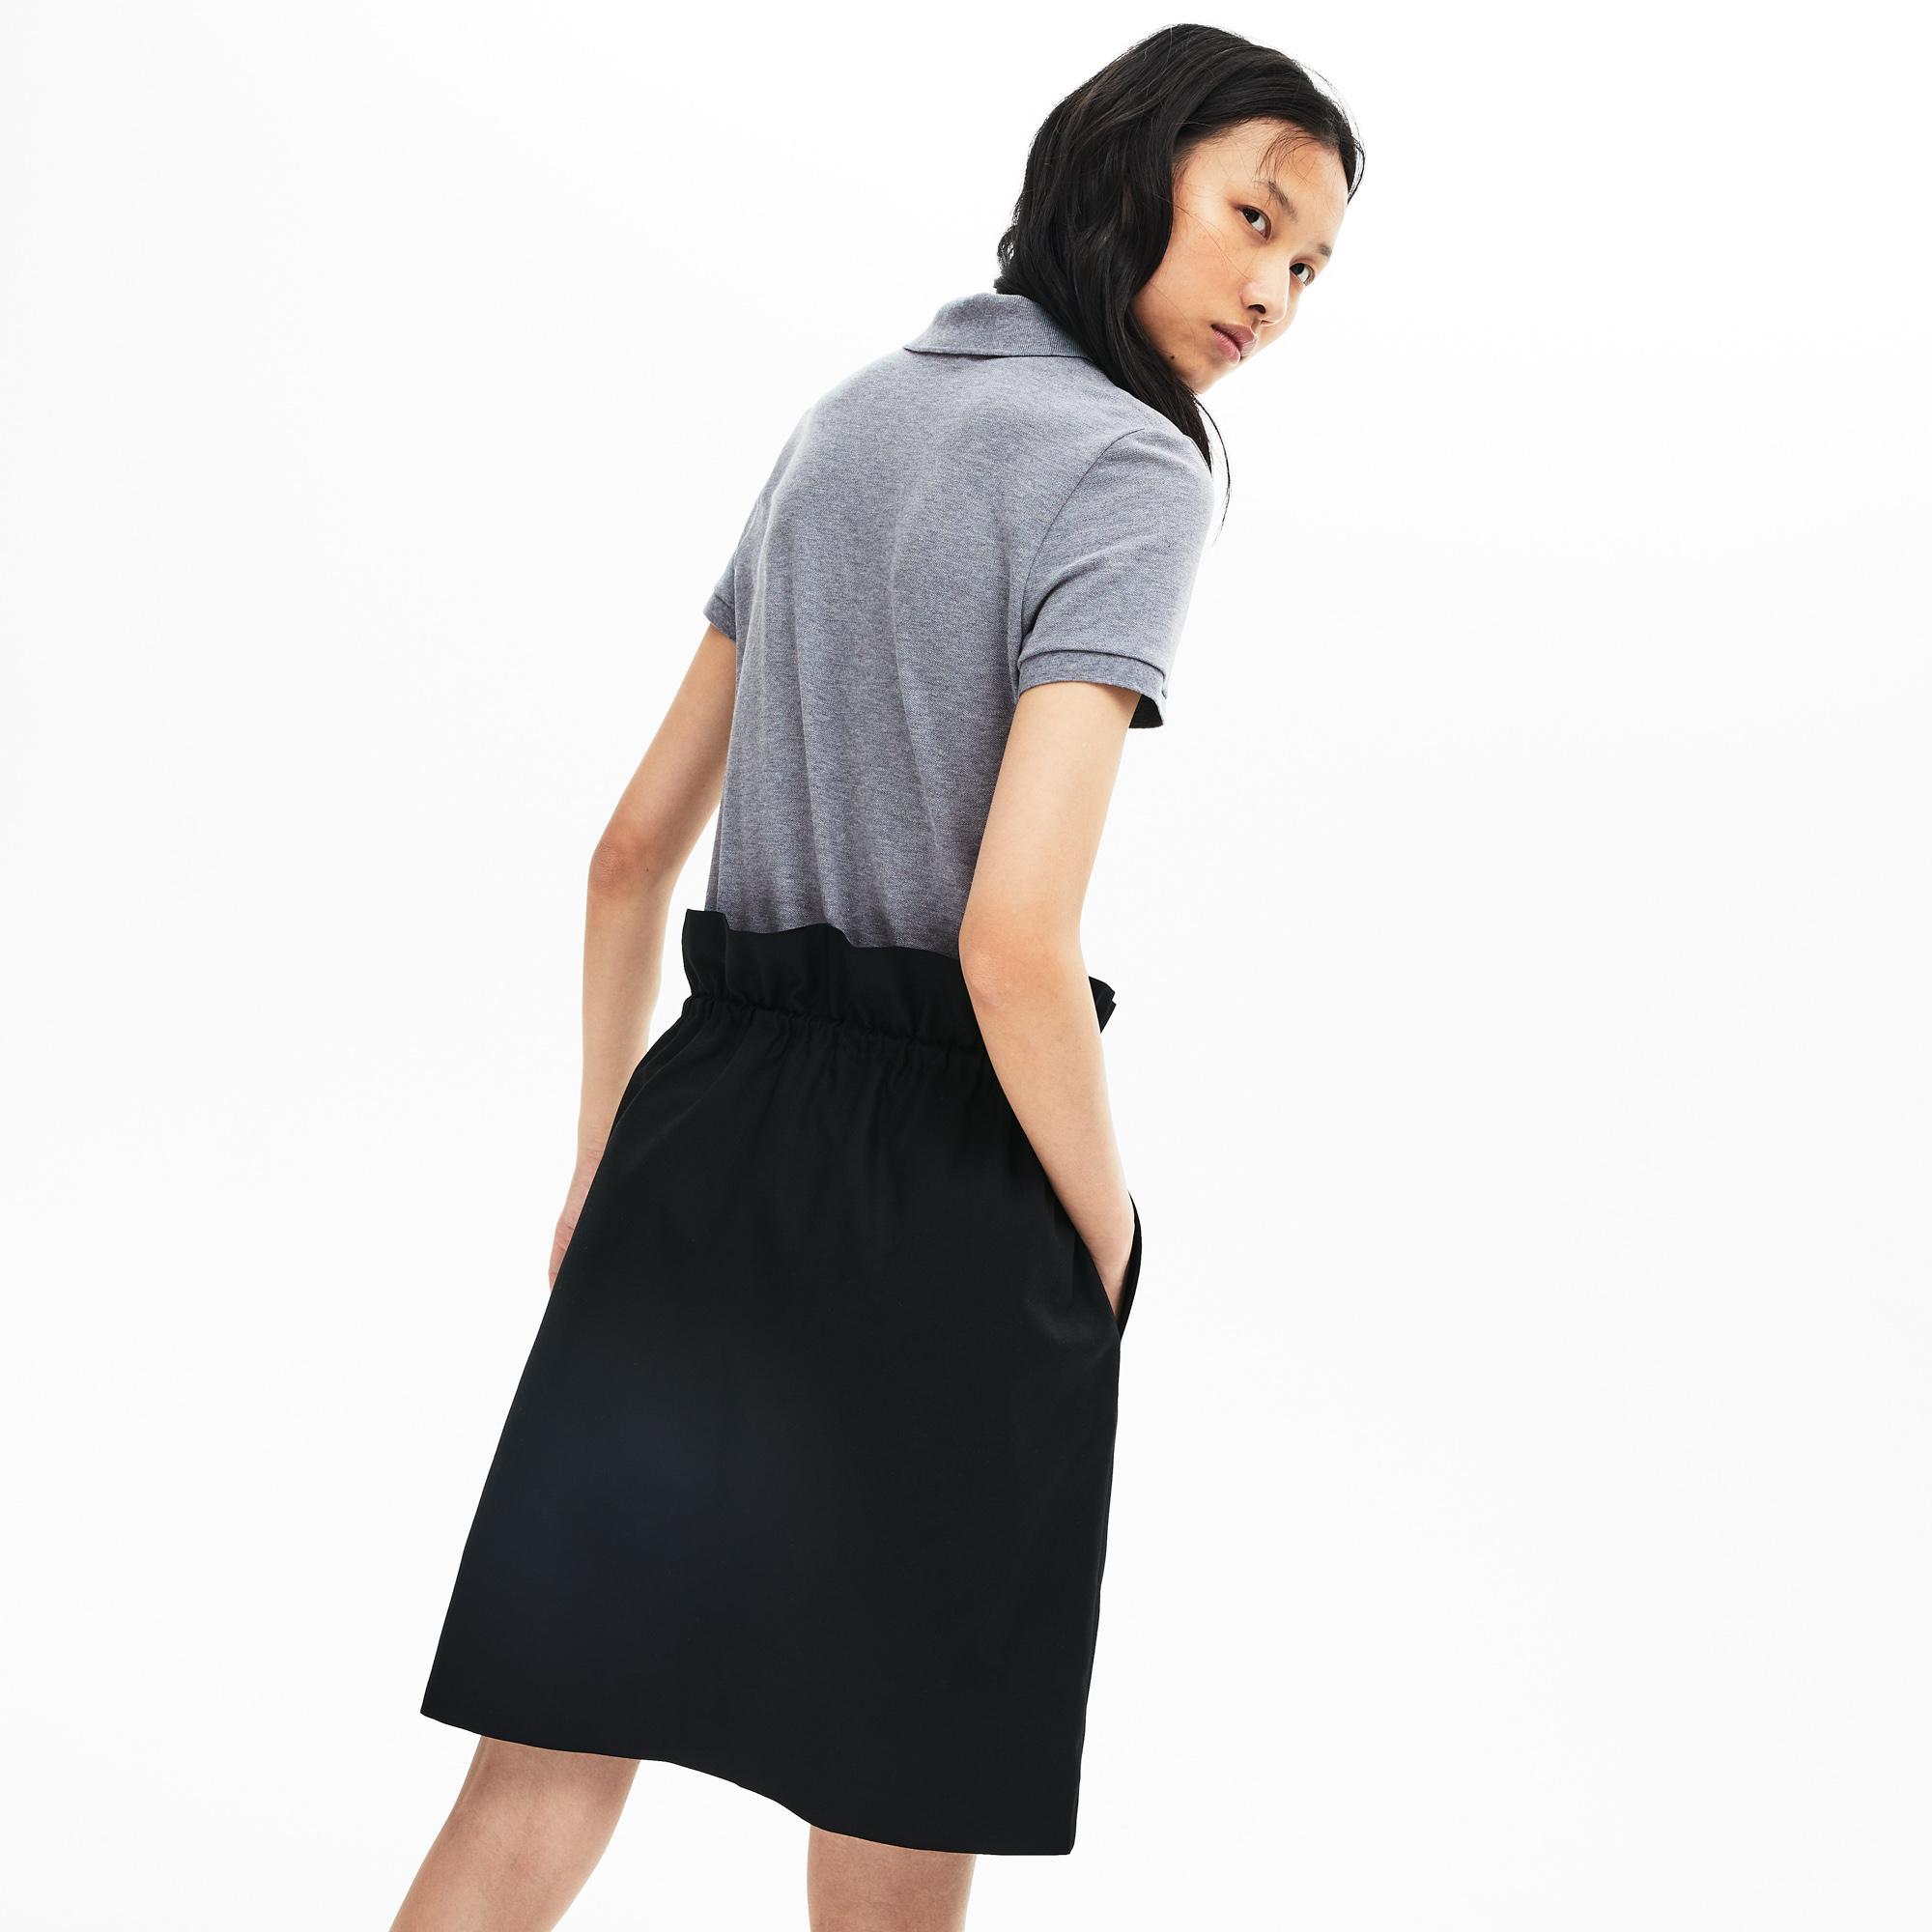 Lacoste Kadın Slim Fit Gri Polo